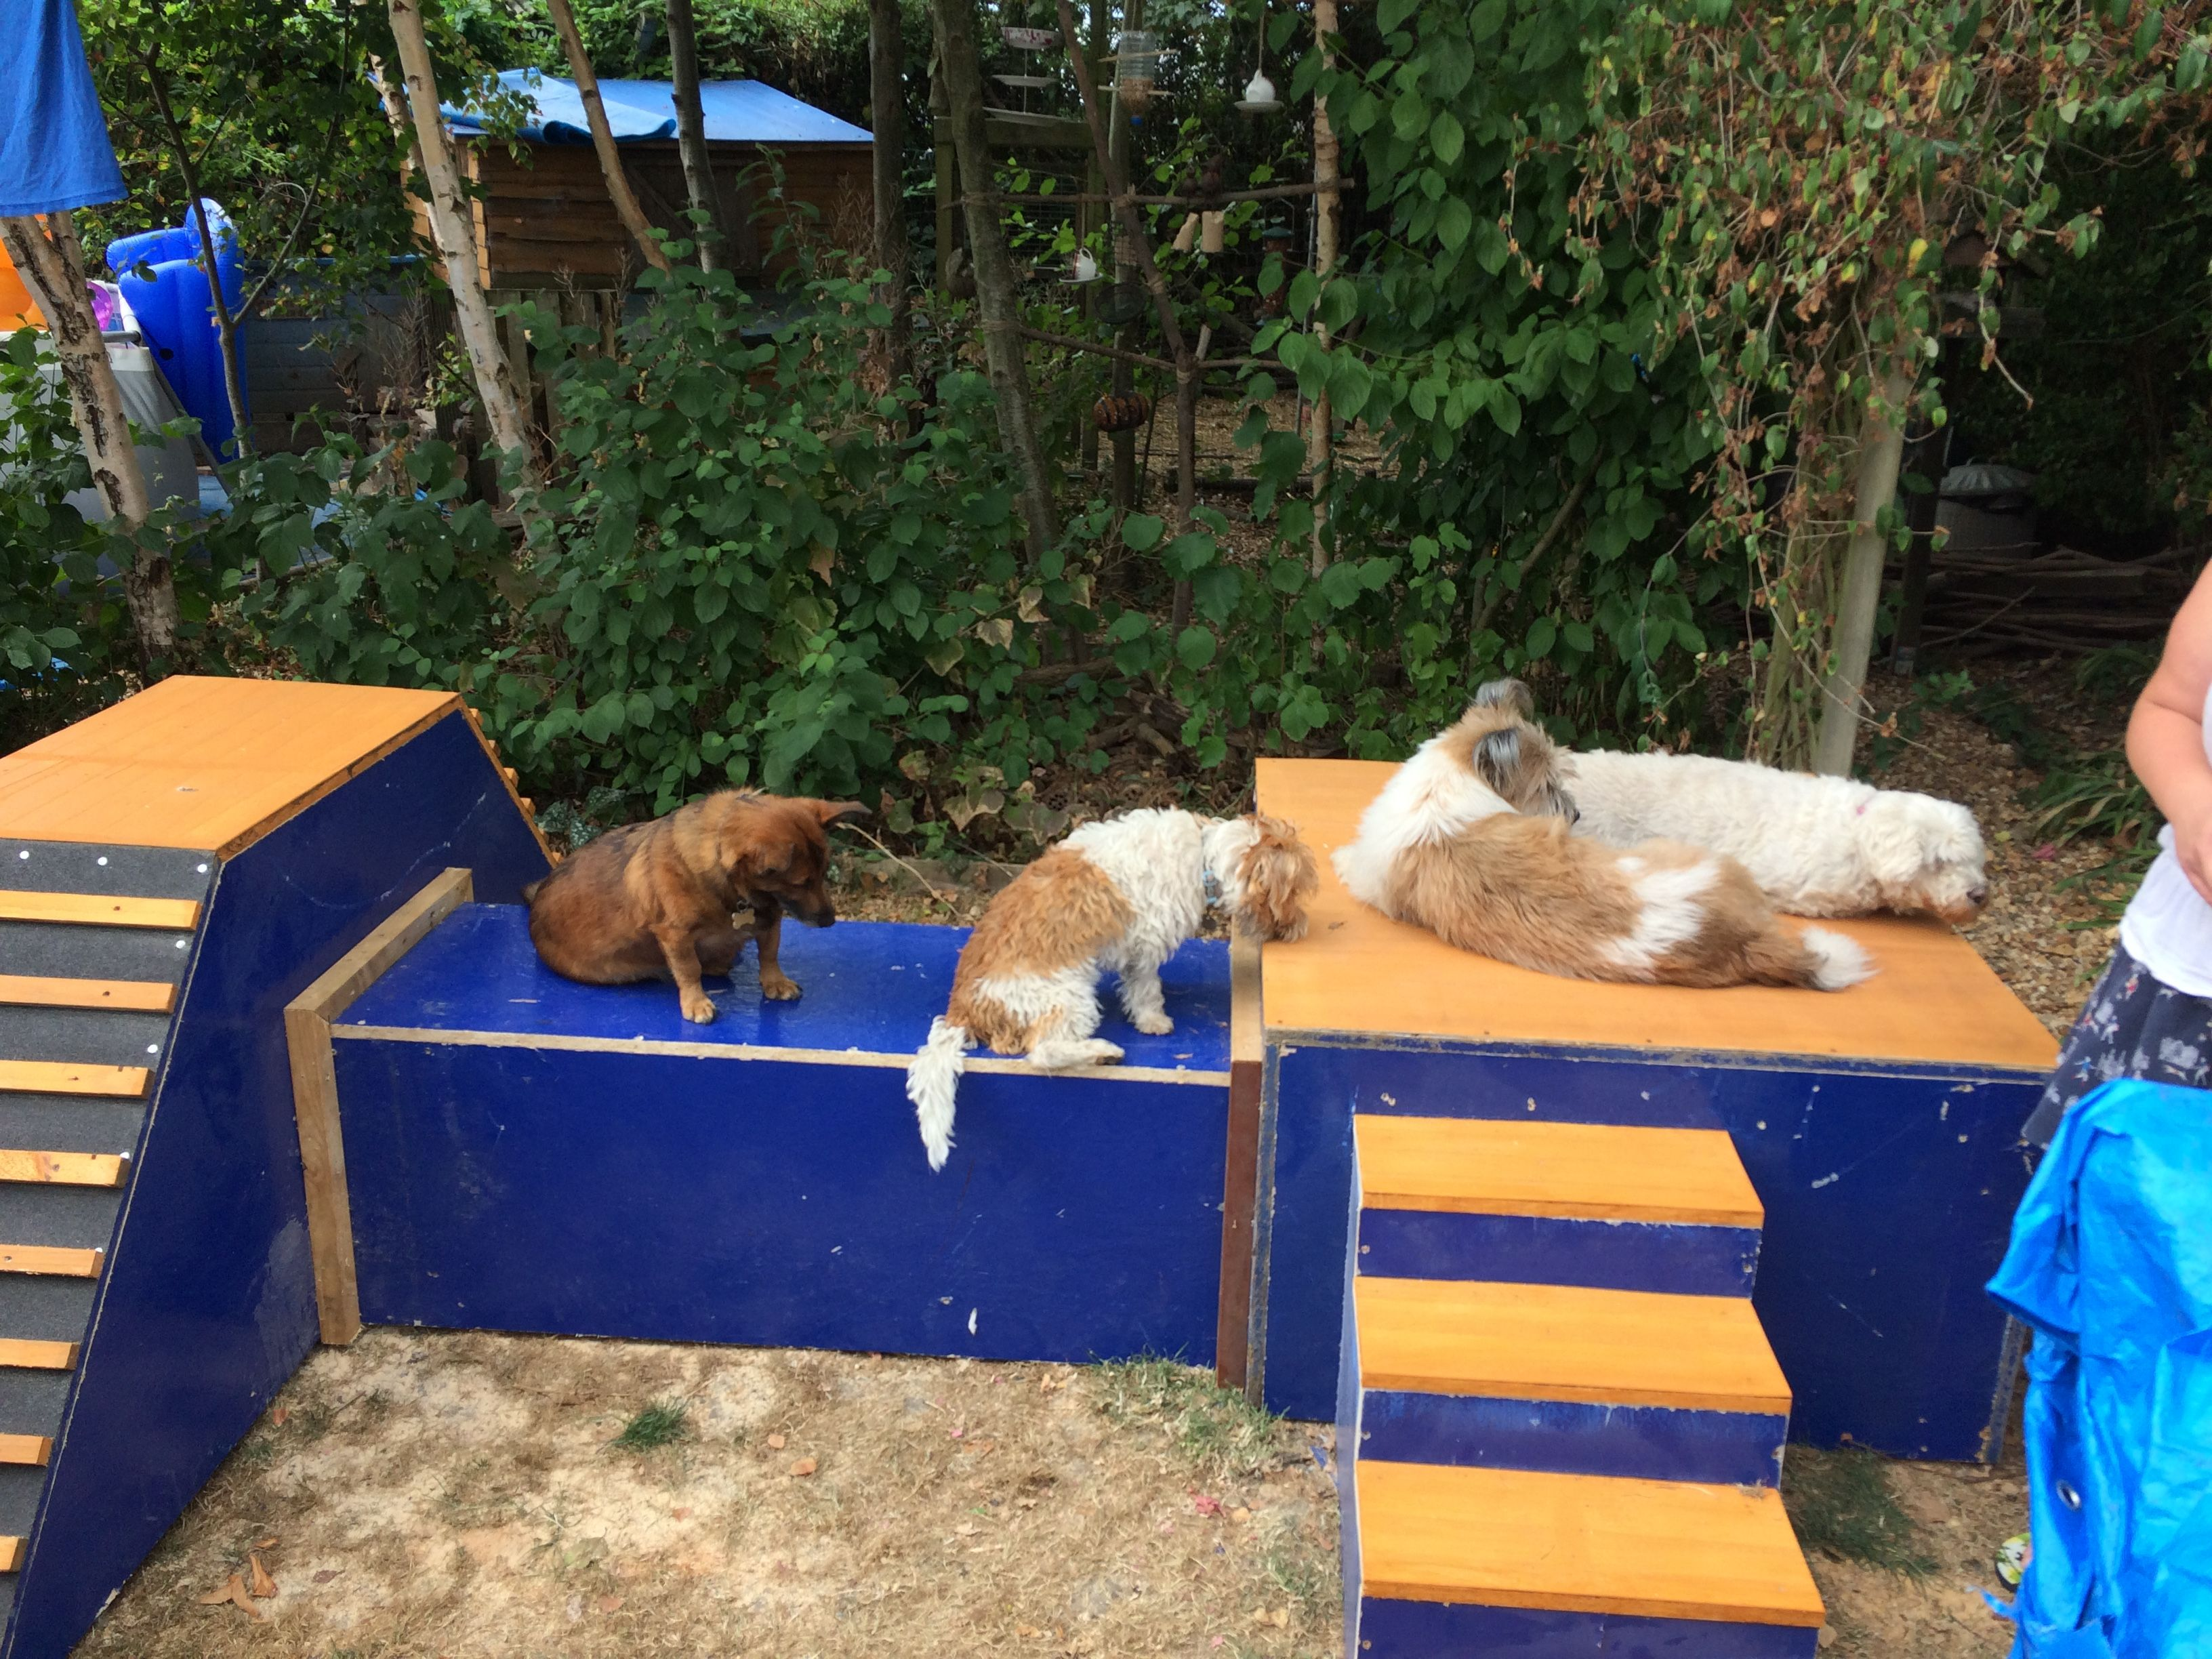 Our Diy Dog Playground Dog Playground Diy Dog Stuff Dog Area Diy backyard dog playground